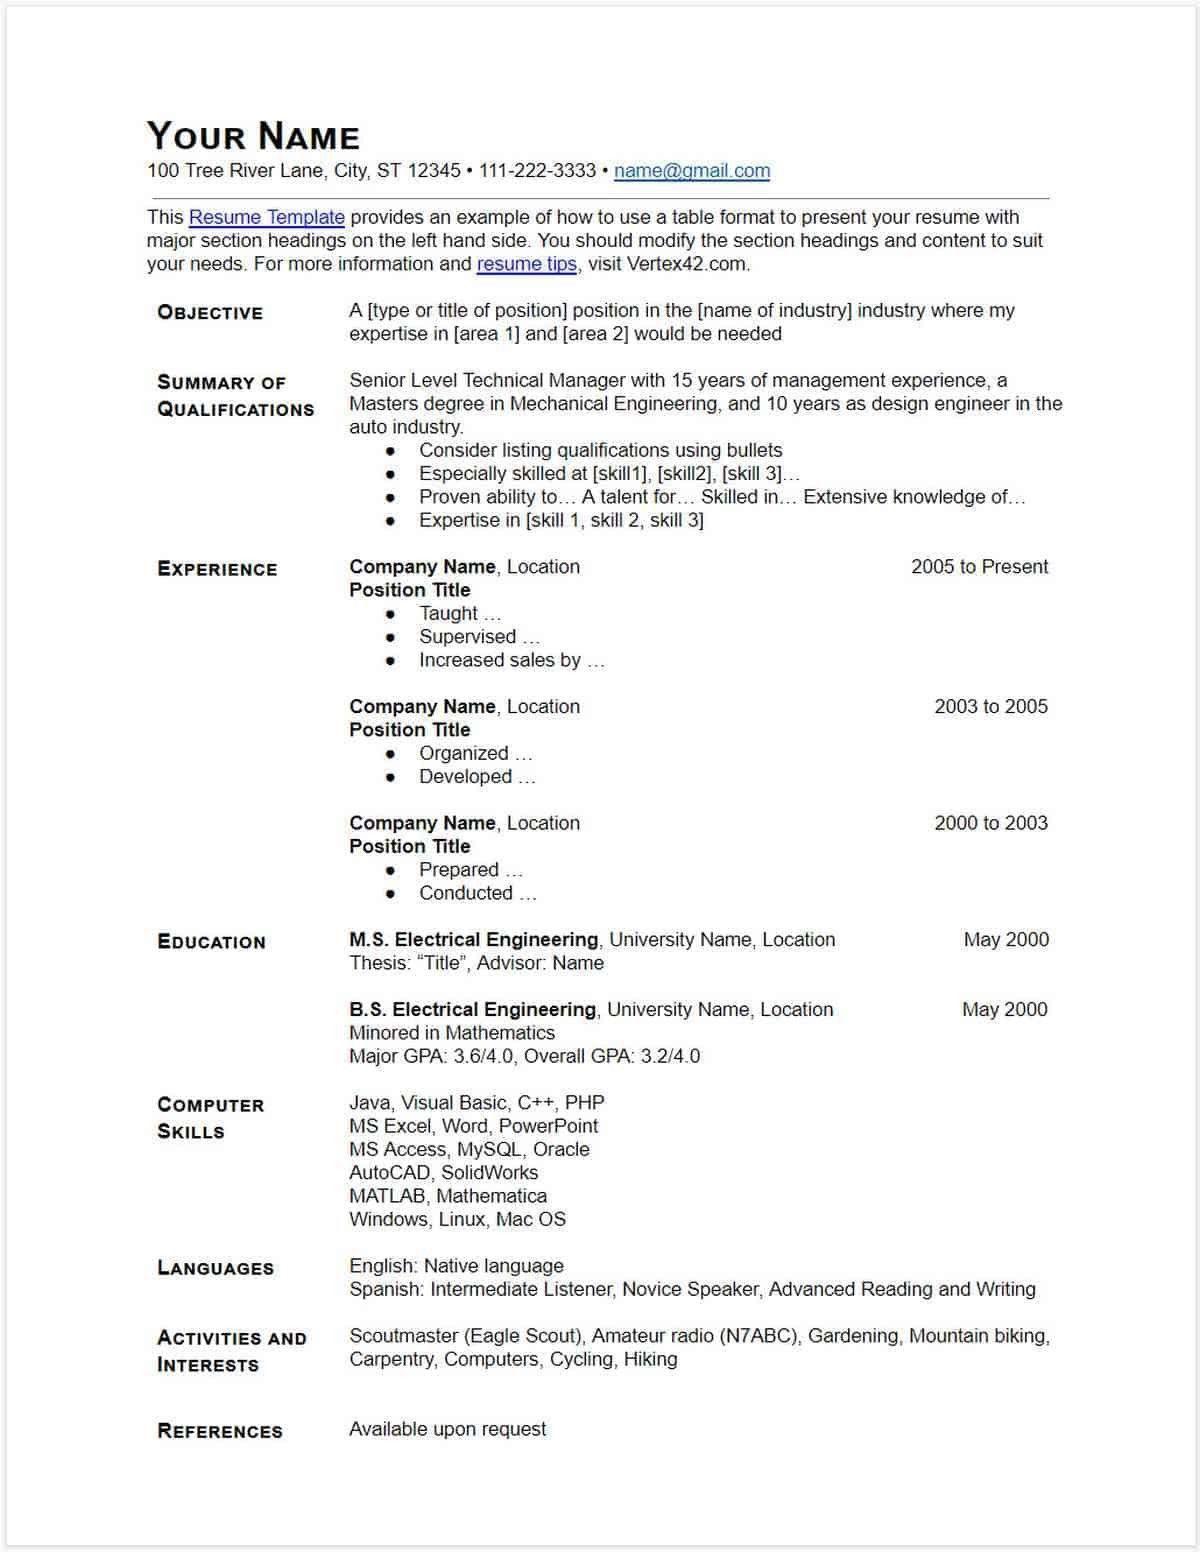 Google Doc Resume Templates Fresh 30 Google Docs Resume Templates Of 39 Special Go Resume Template Free Microsoft Word Resume Template Sample Resume Templates